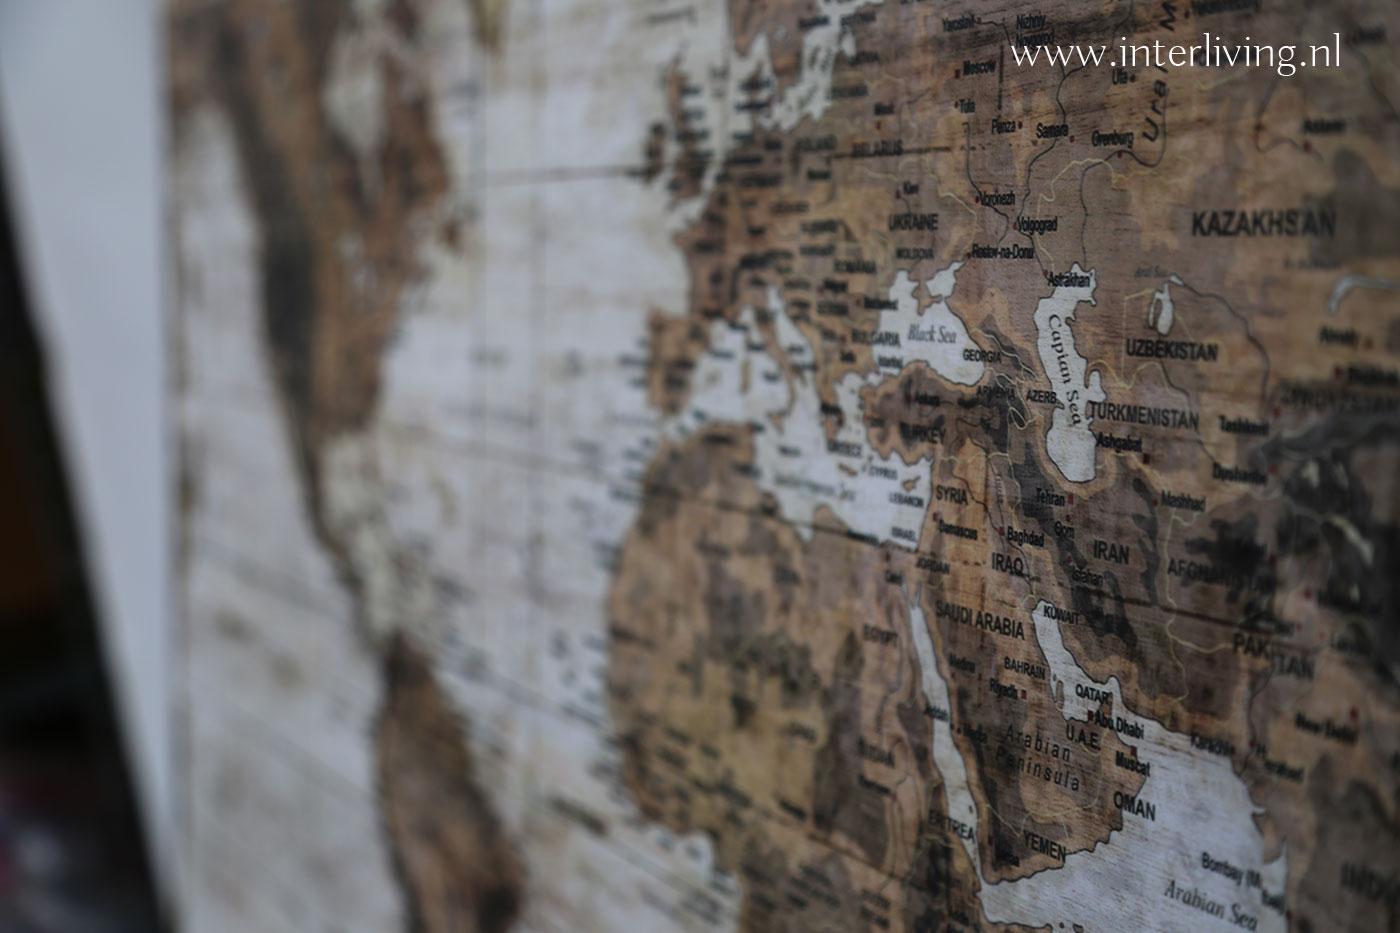 wereldkaart houten panelen